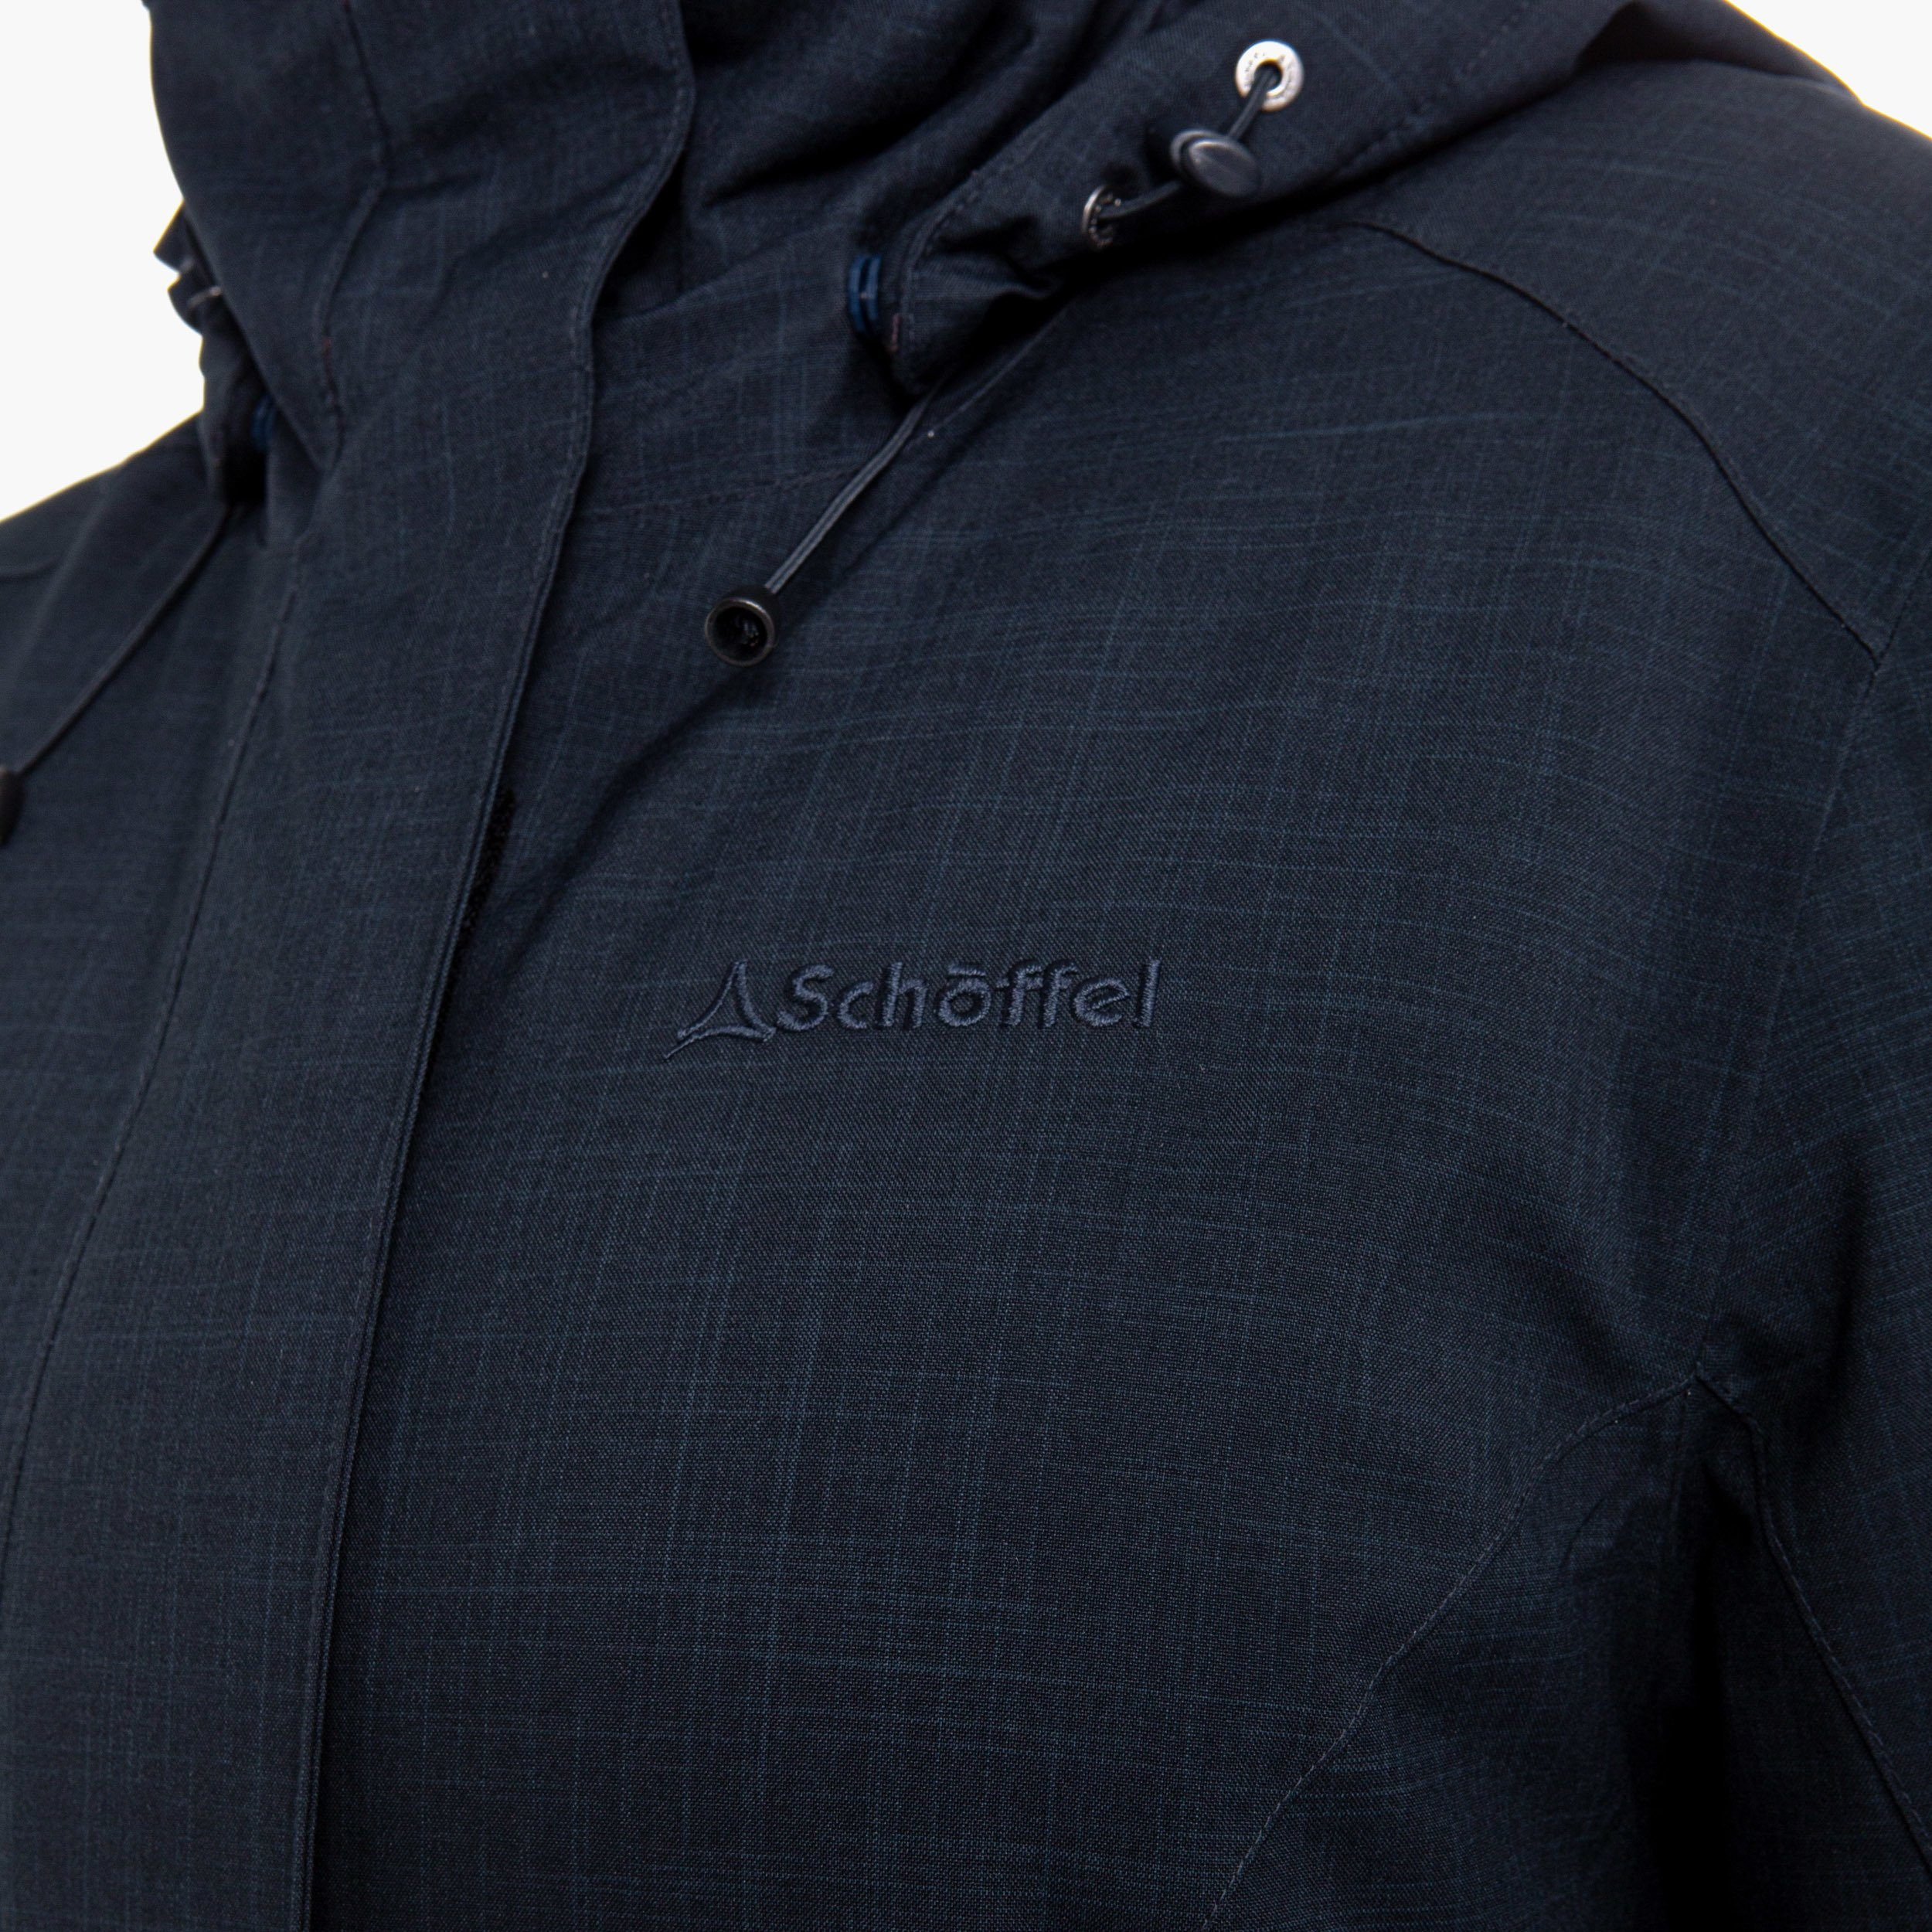 schöffel ins amsterdam l ladies jacket go29e0